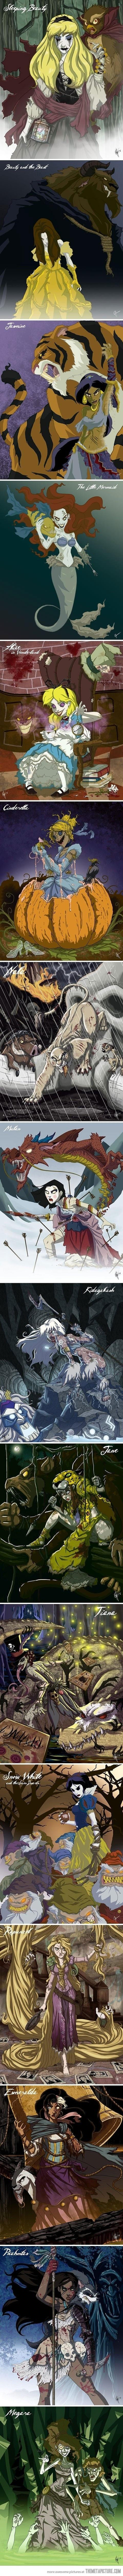 Princesas do mal kkkkk